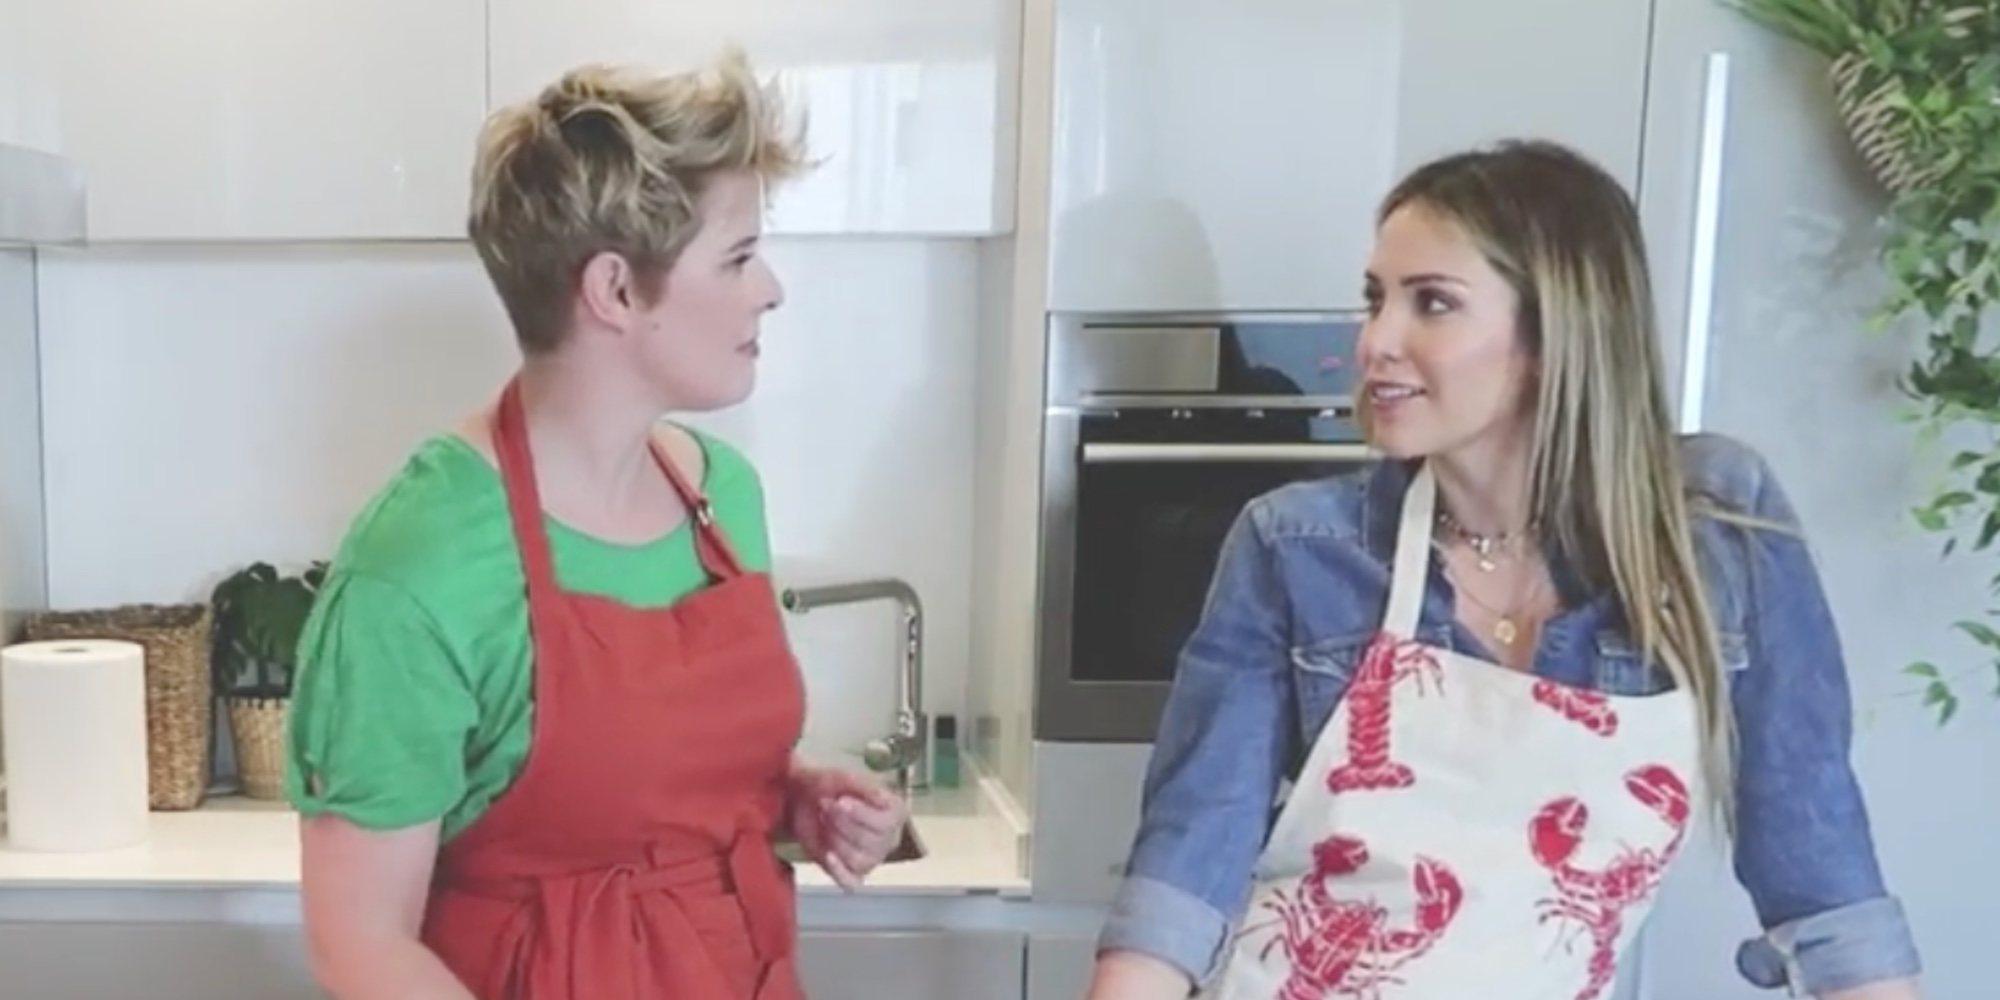 Rosanna Zanetti revela a Tania Llasera cómo conoció a David Bisbal mientras cocinan juntas